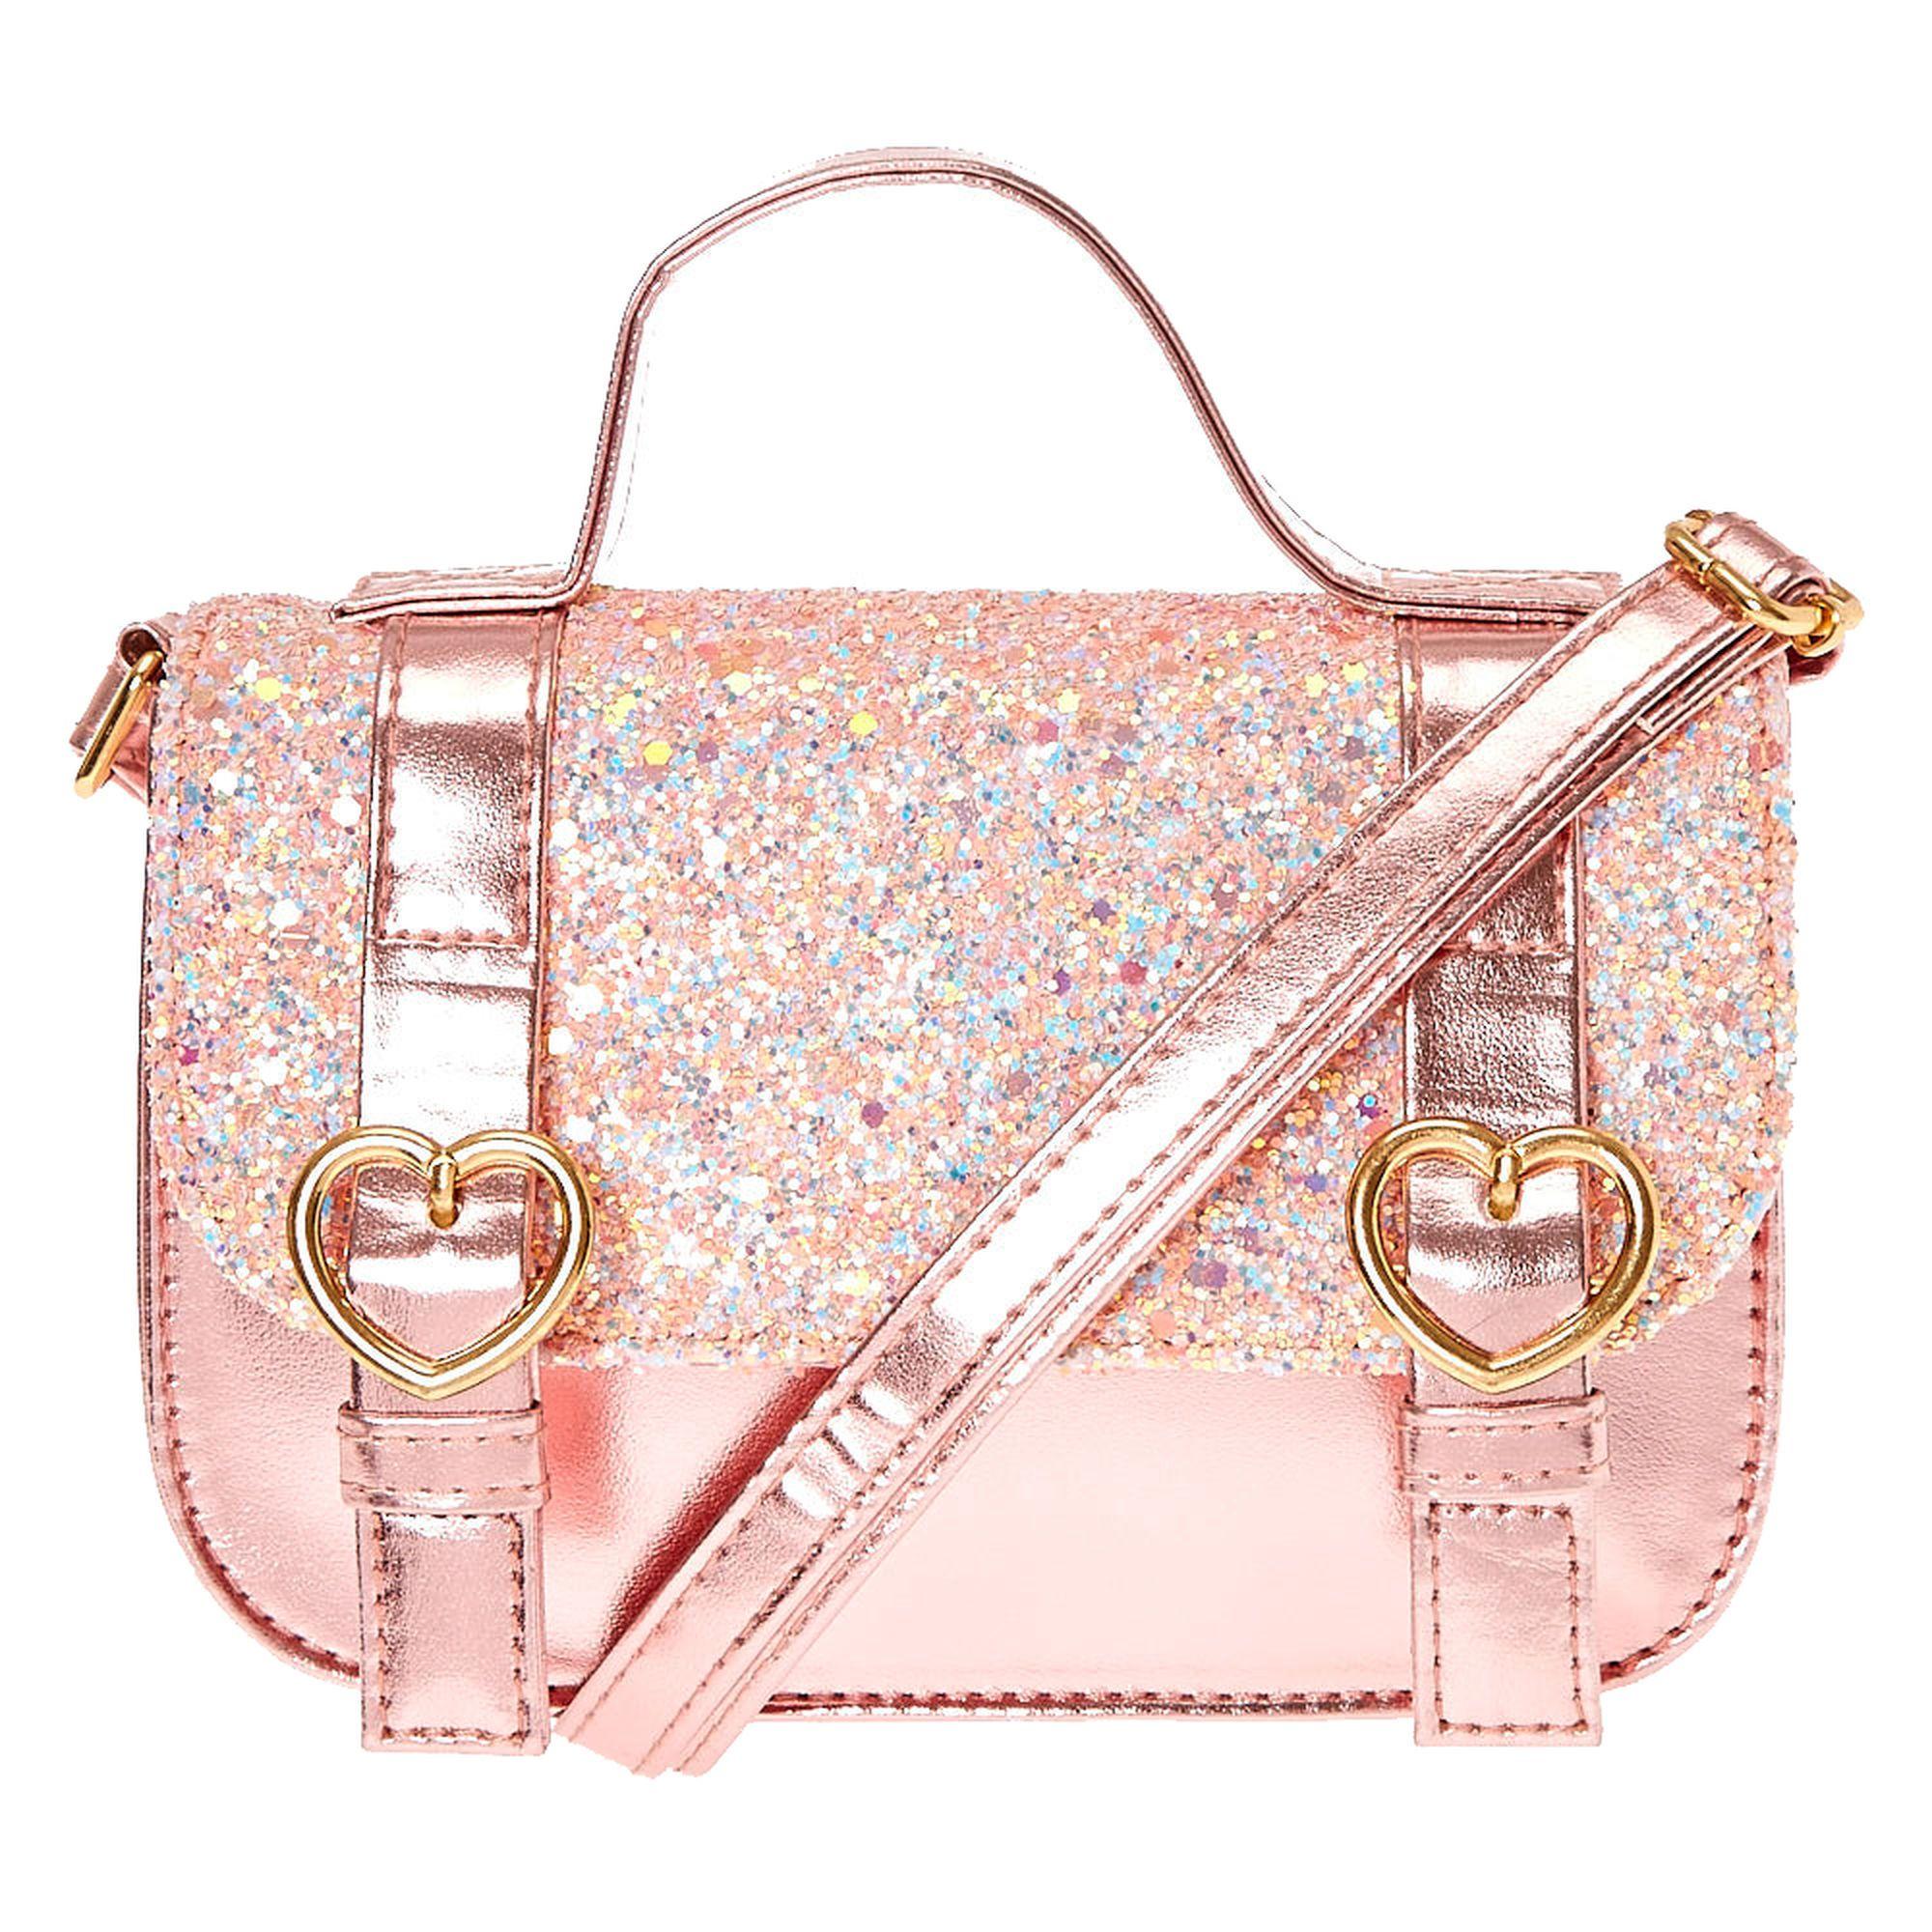 52b4a21f292e Kids Pink Glitter Crossbody Bag. Kids Pink Glitter Crossbody Bag Cute  Backpacks